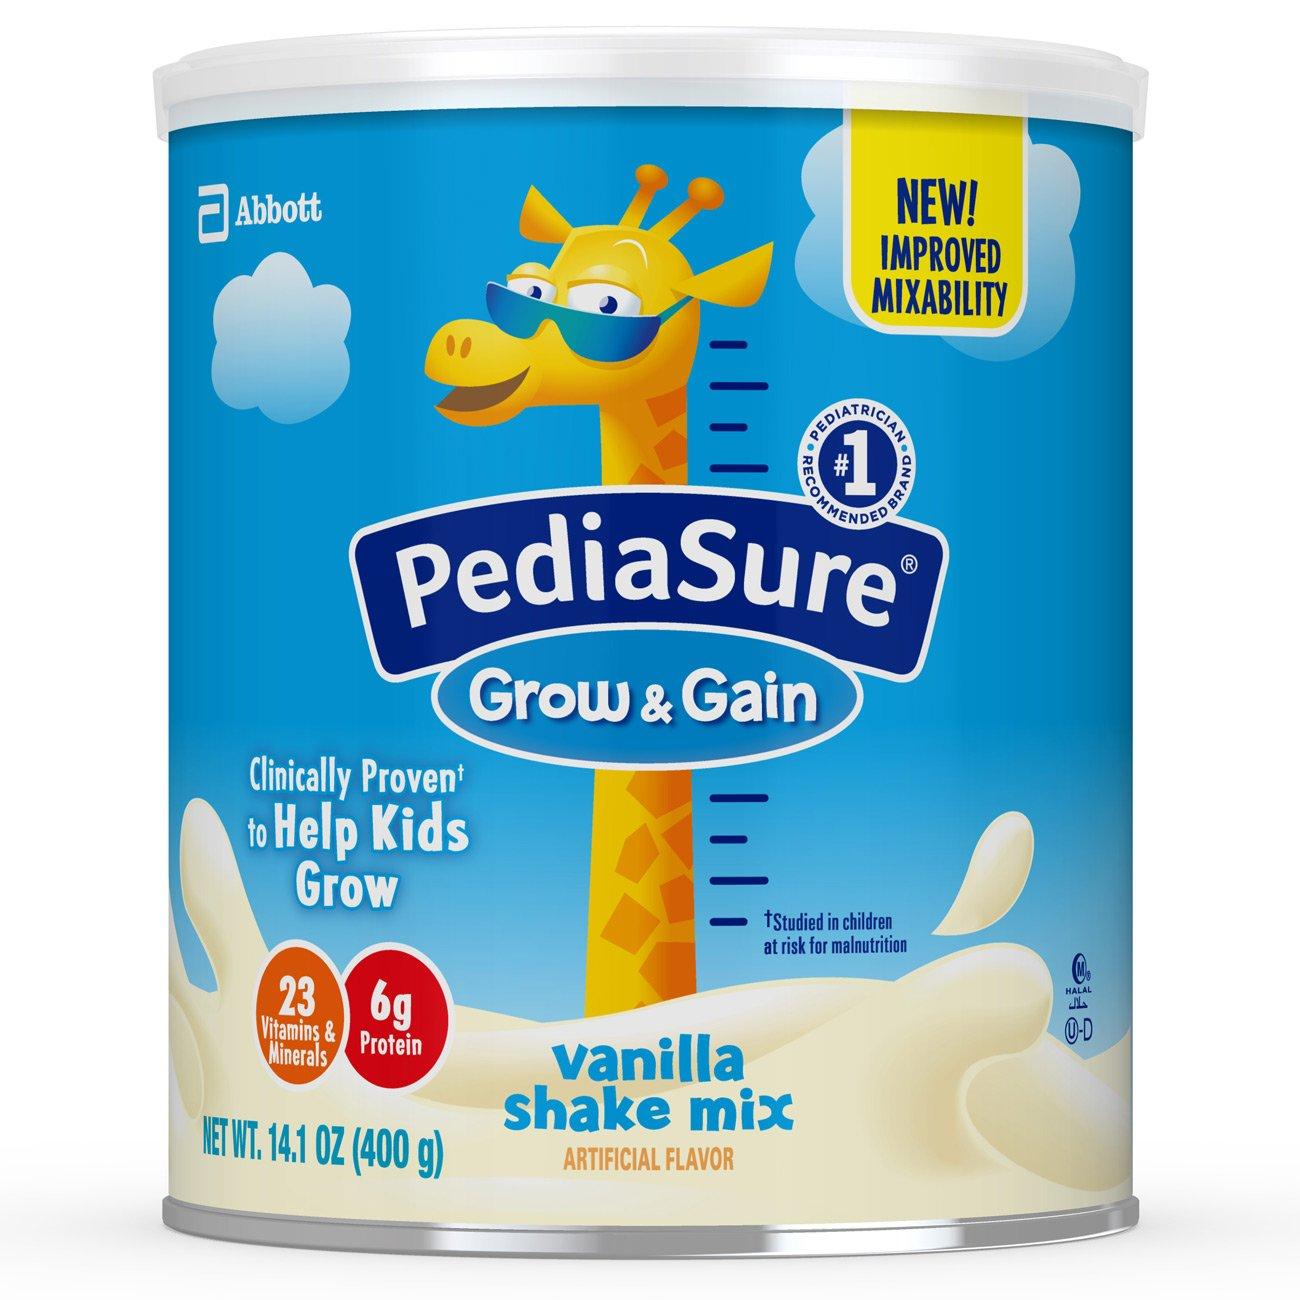 PediaSure Grow & Gain Non-GMO Vanilla Shake Mix Powder, Nutrition Shake for Kids, 14.1 oz, 3 Count